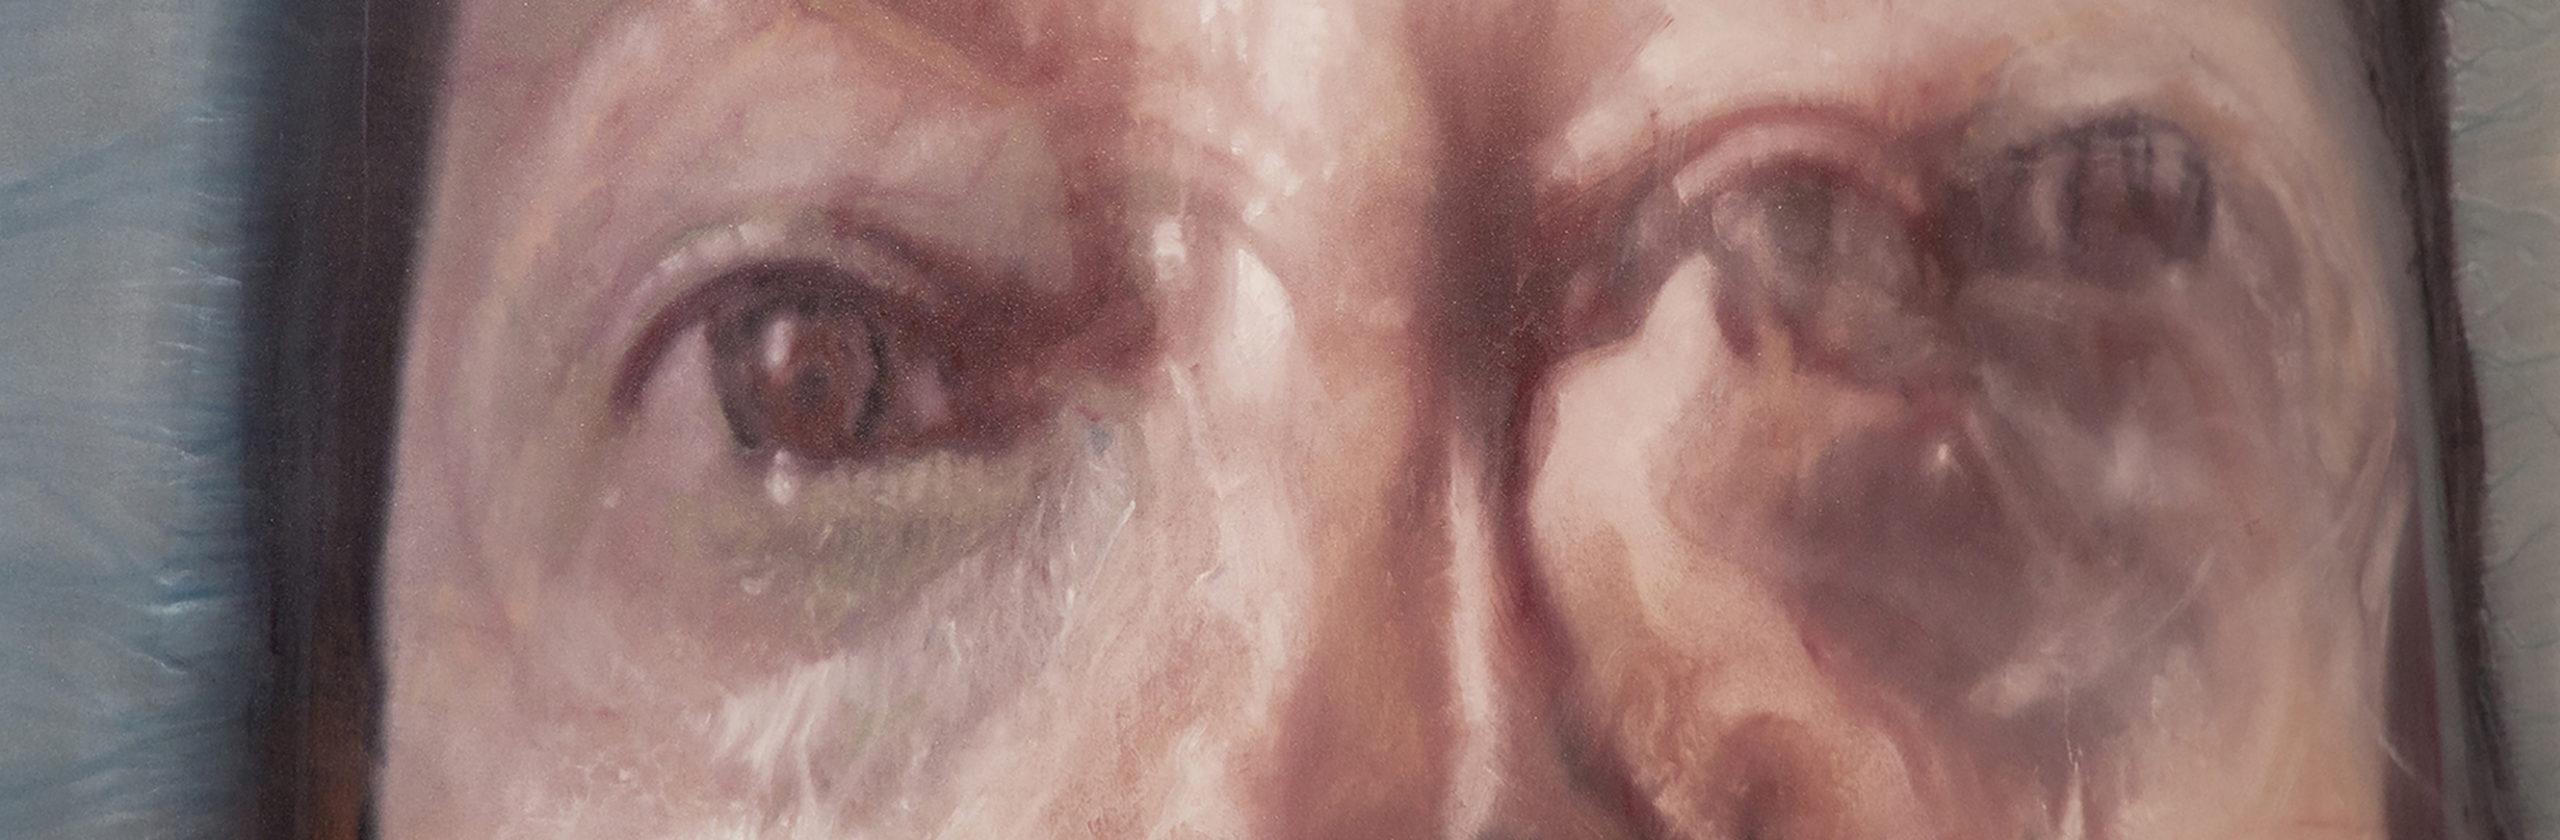 Hugo Bonamin - Portraits fantômes